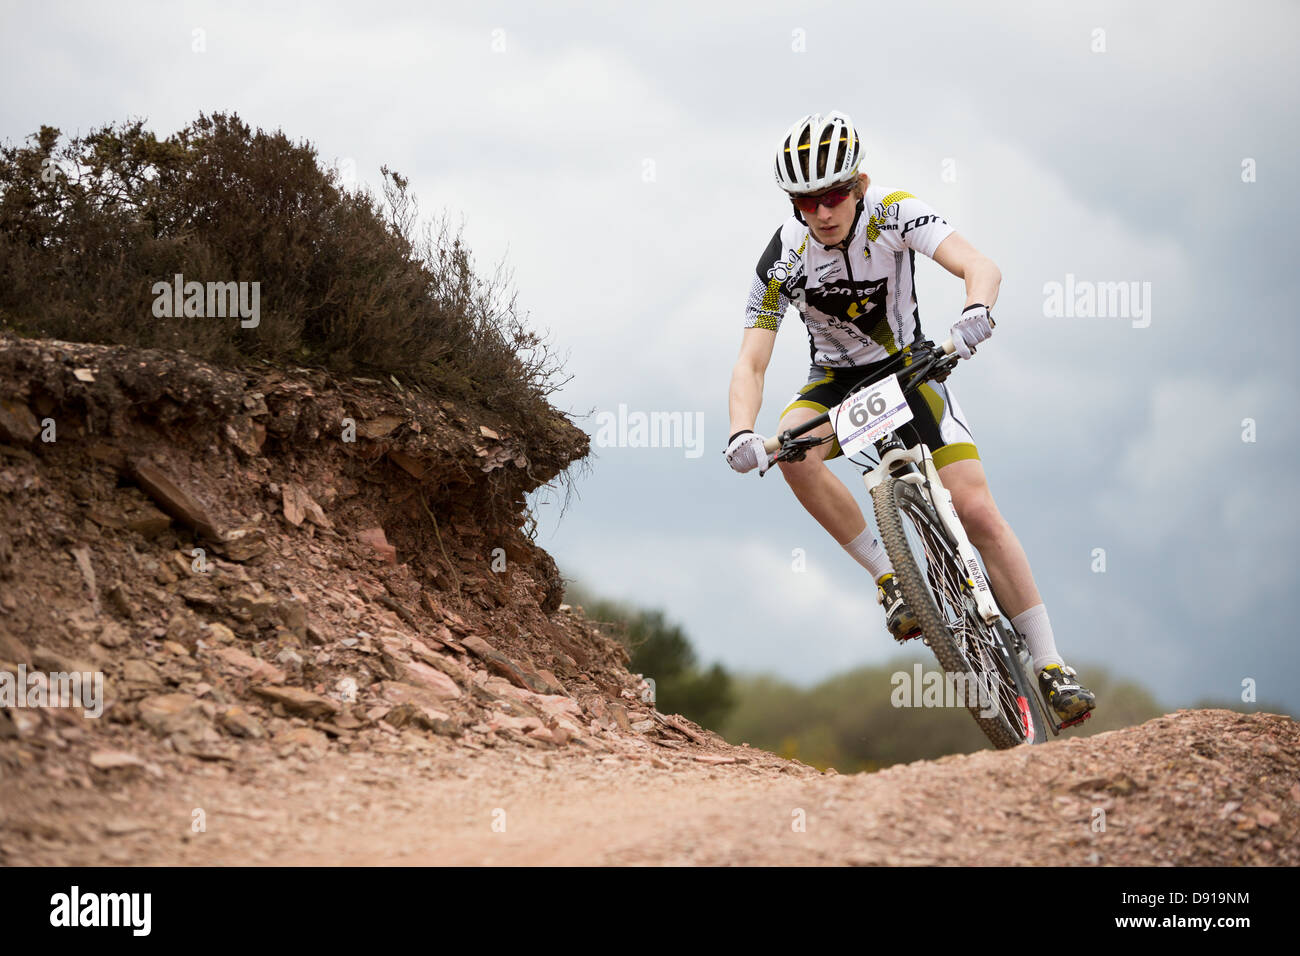 WHEAL MAYD VALLEY, REDRUTH, UK. British XC Series Round 2, mountain bike cross country race. - Stock Image